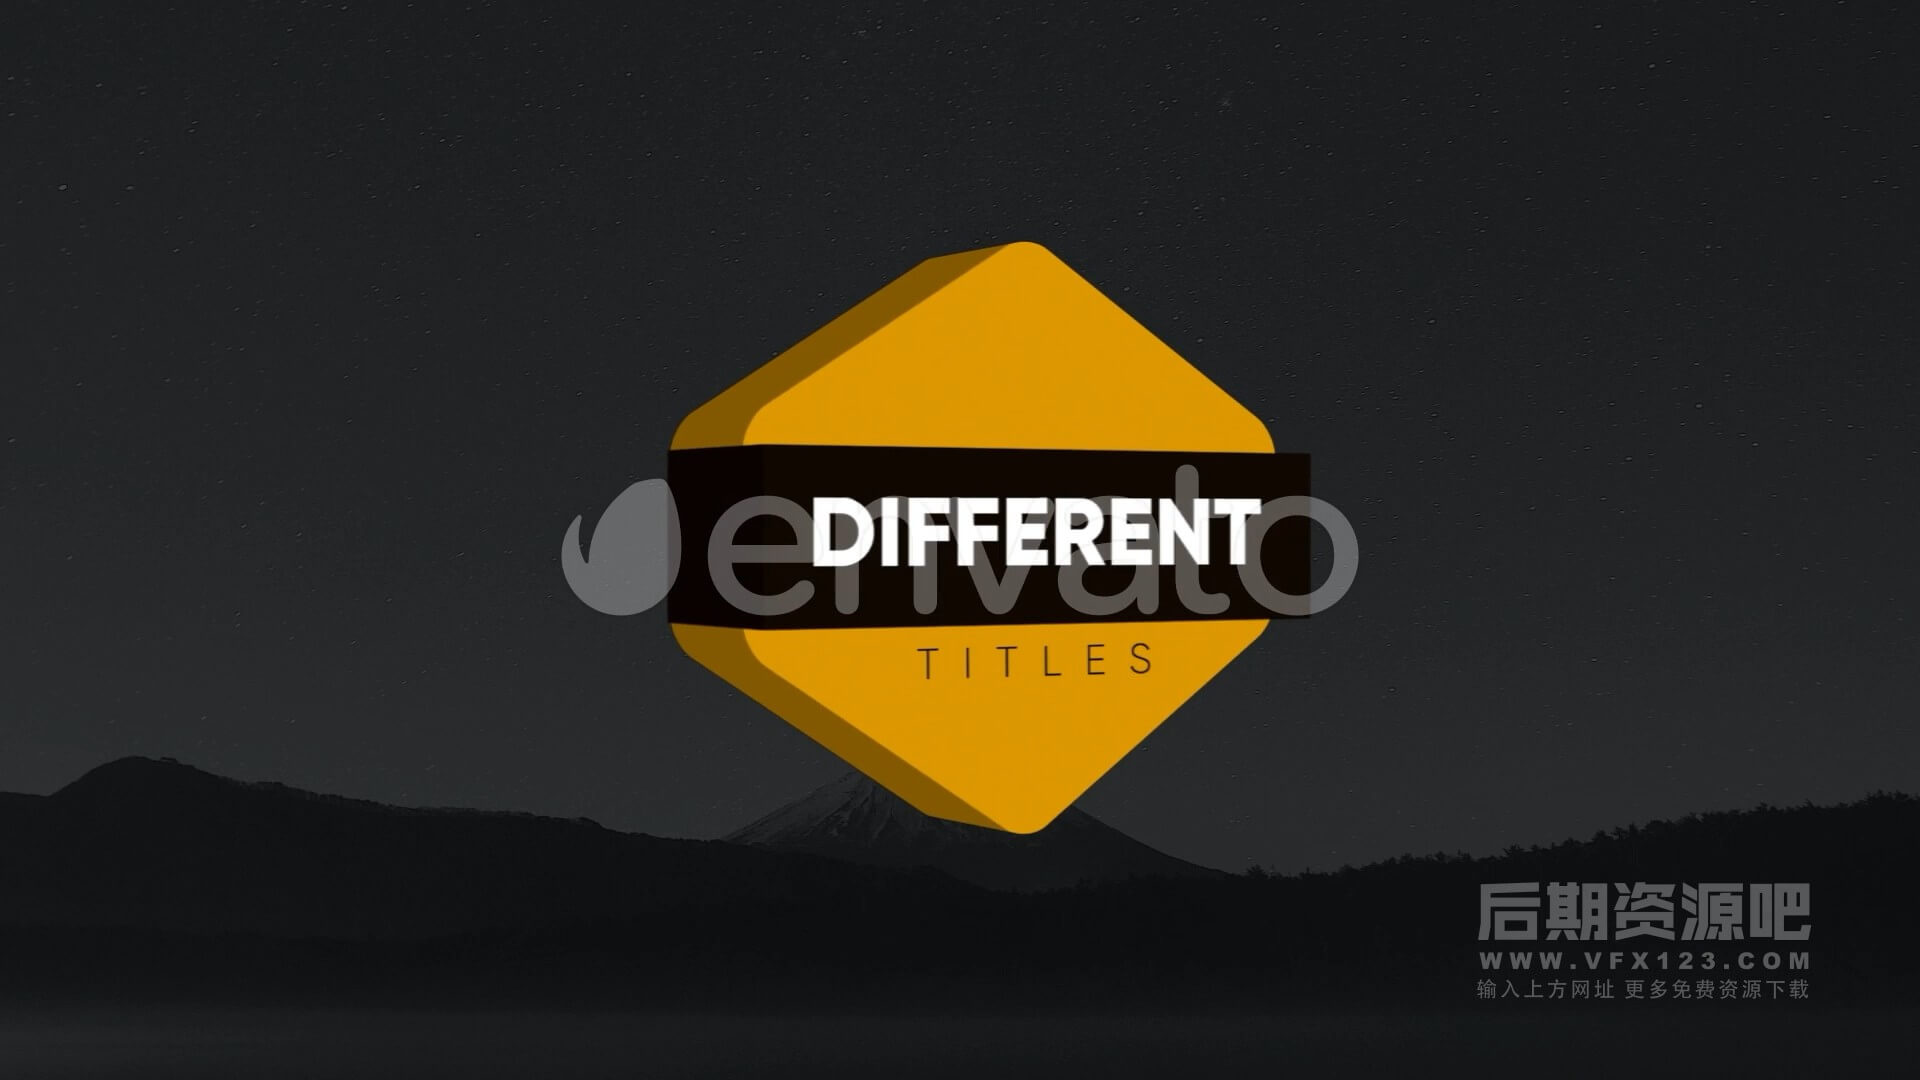 Fcpx标题插件 3D立体标题制作工具 Modern Isometric Titles